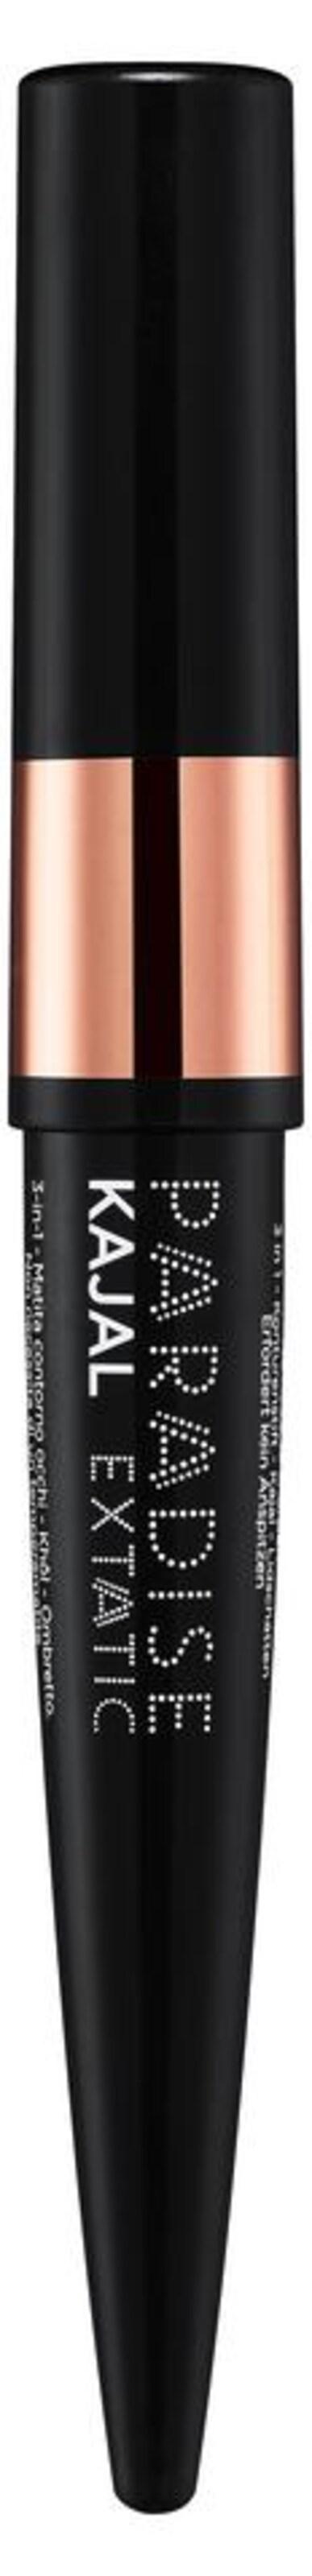 L'oréal Paris Kajal In Extatic' 'paradise Eyeliner Schwarz R354AjL